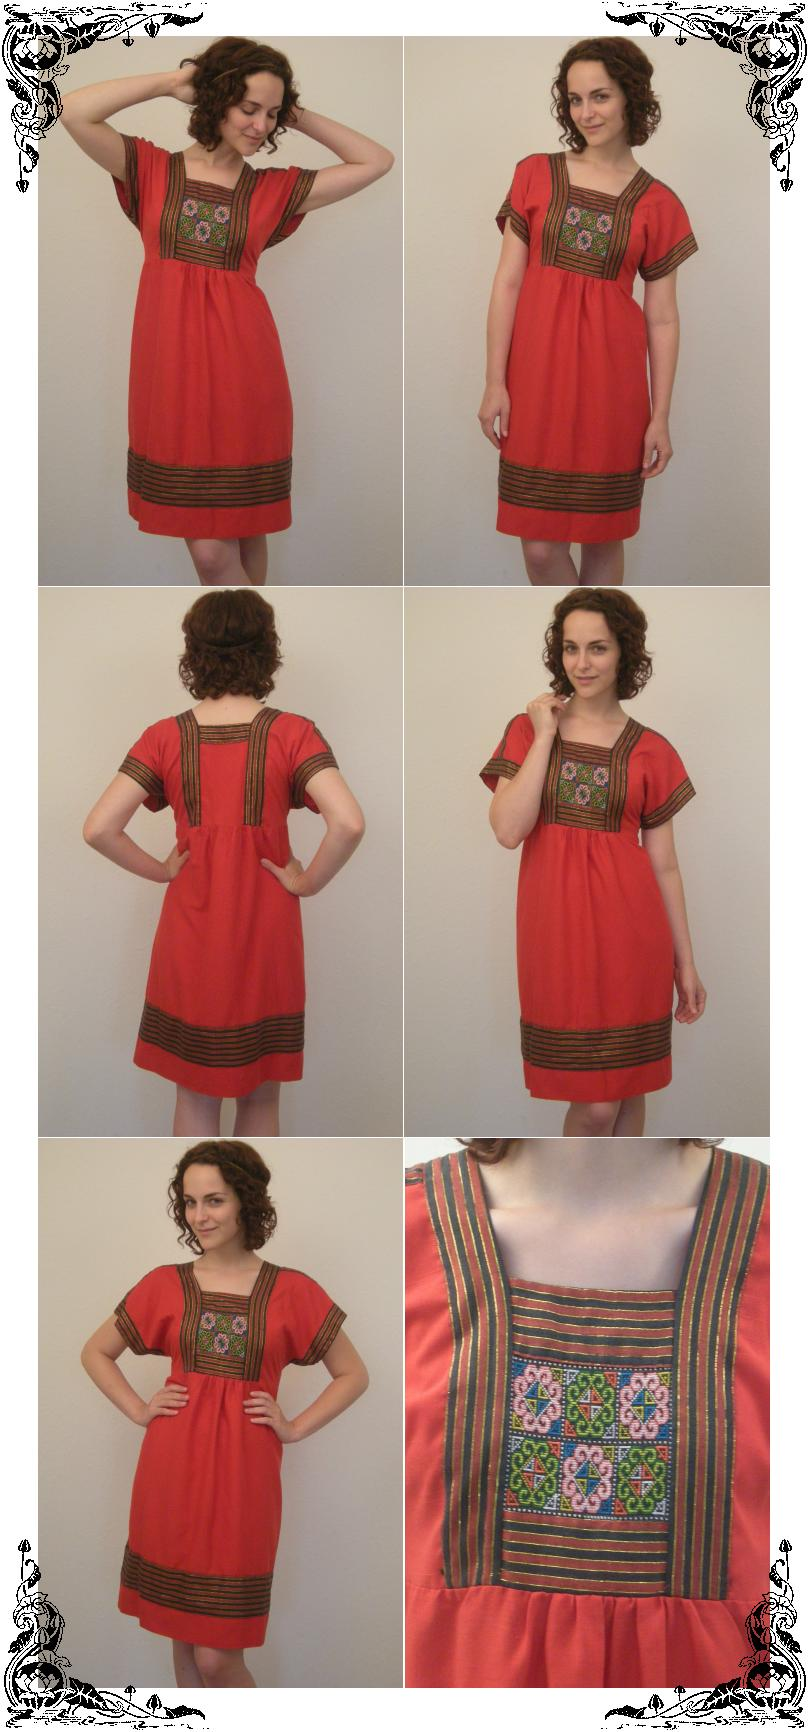 Vtg Red Hippie Babydoll Embroidered Ethnic Boho Dress M - eBay (item 200242844235 end time Aug-05-08 18:01:26 PDT)